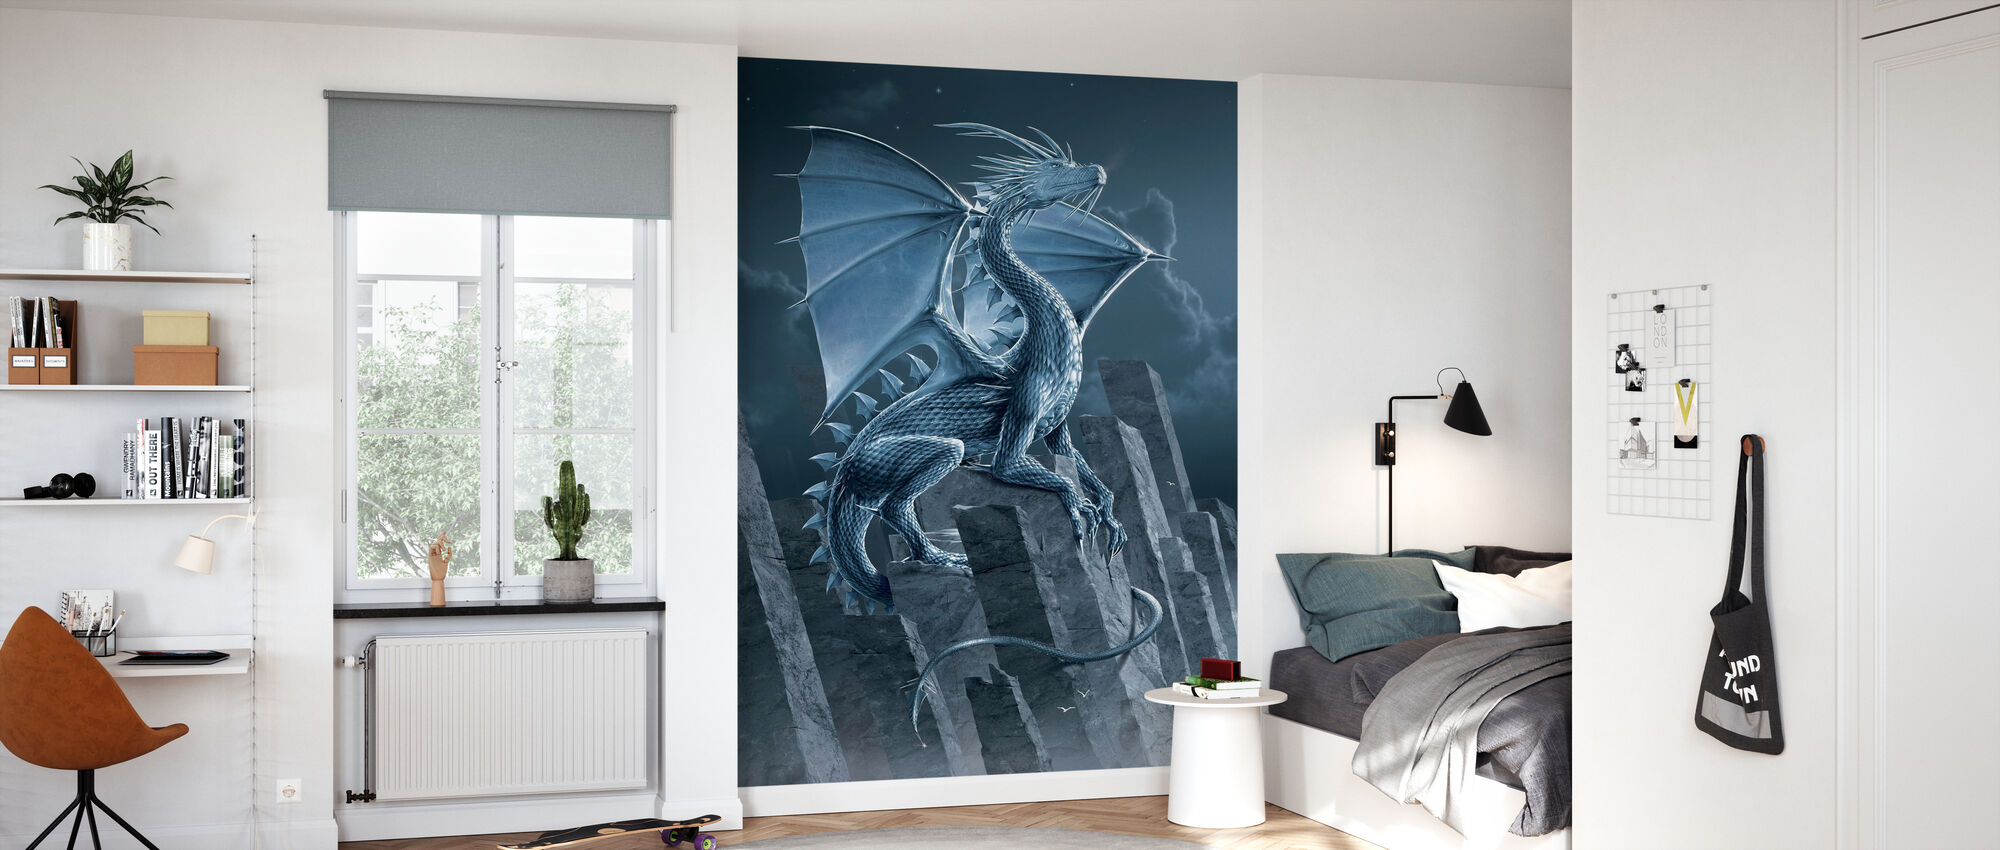 Silver Dragon - Wallpaper - Kids Room